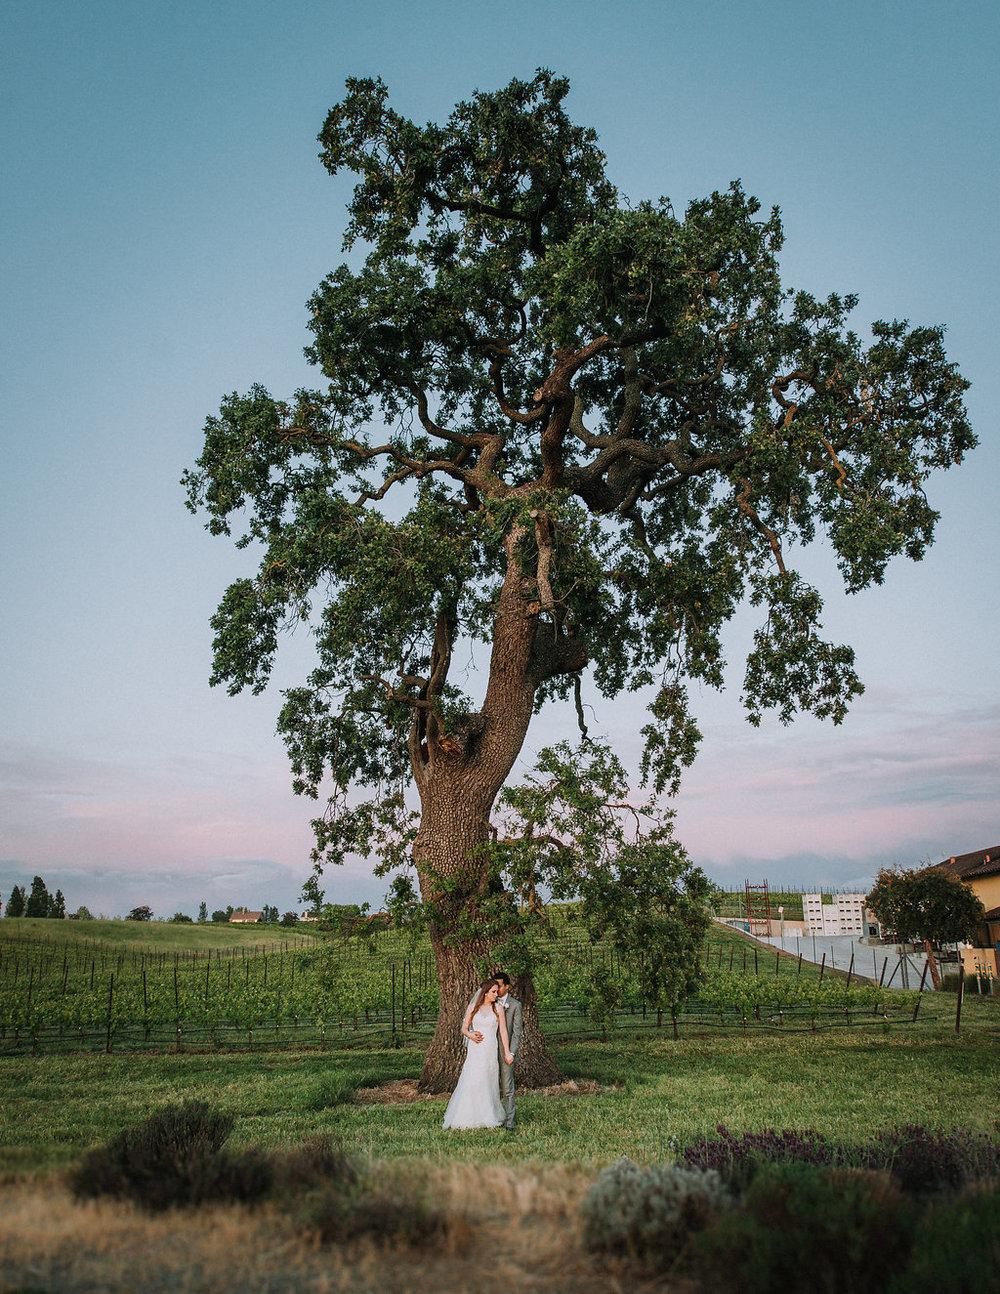 Santa Fe Wedding Photographer, New Mexico Wedding Photographer, San Francisco Destination Wedding Photographer, Santa Fe Destination Photographer, New Mexico Destination Photographer